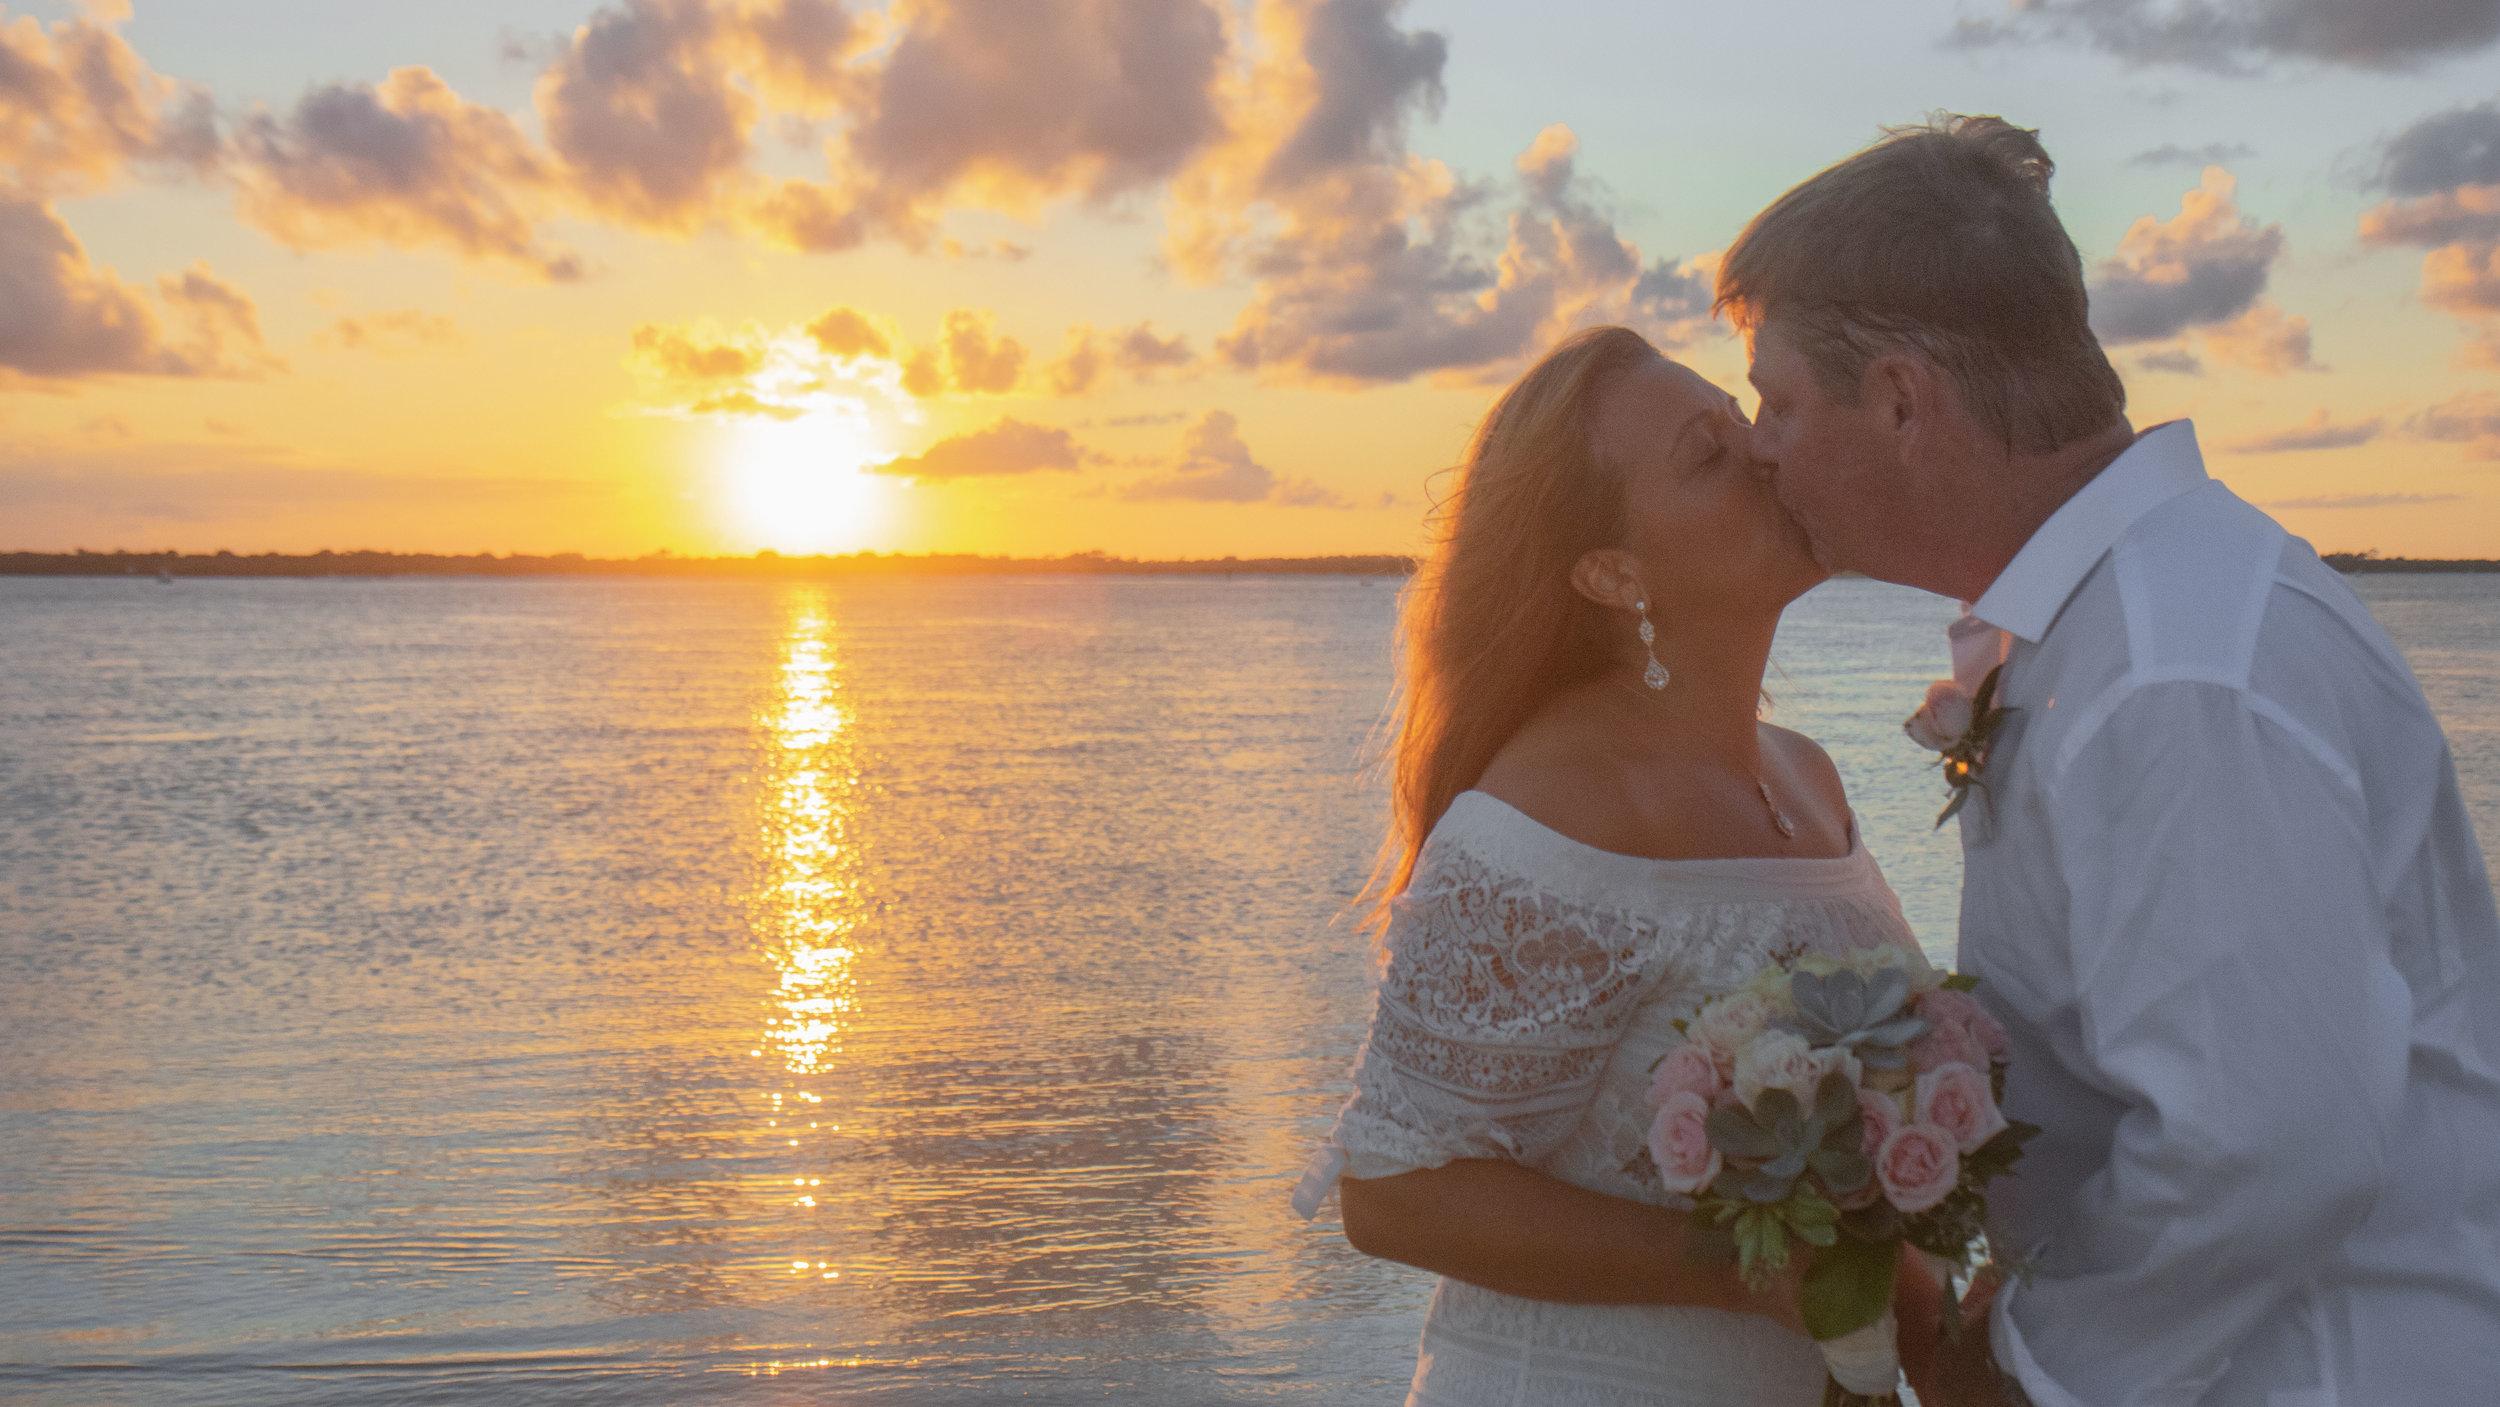 Randy and Cheryl - October 2018 - New Smyrna Beach, FL